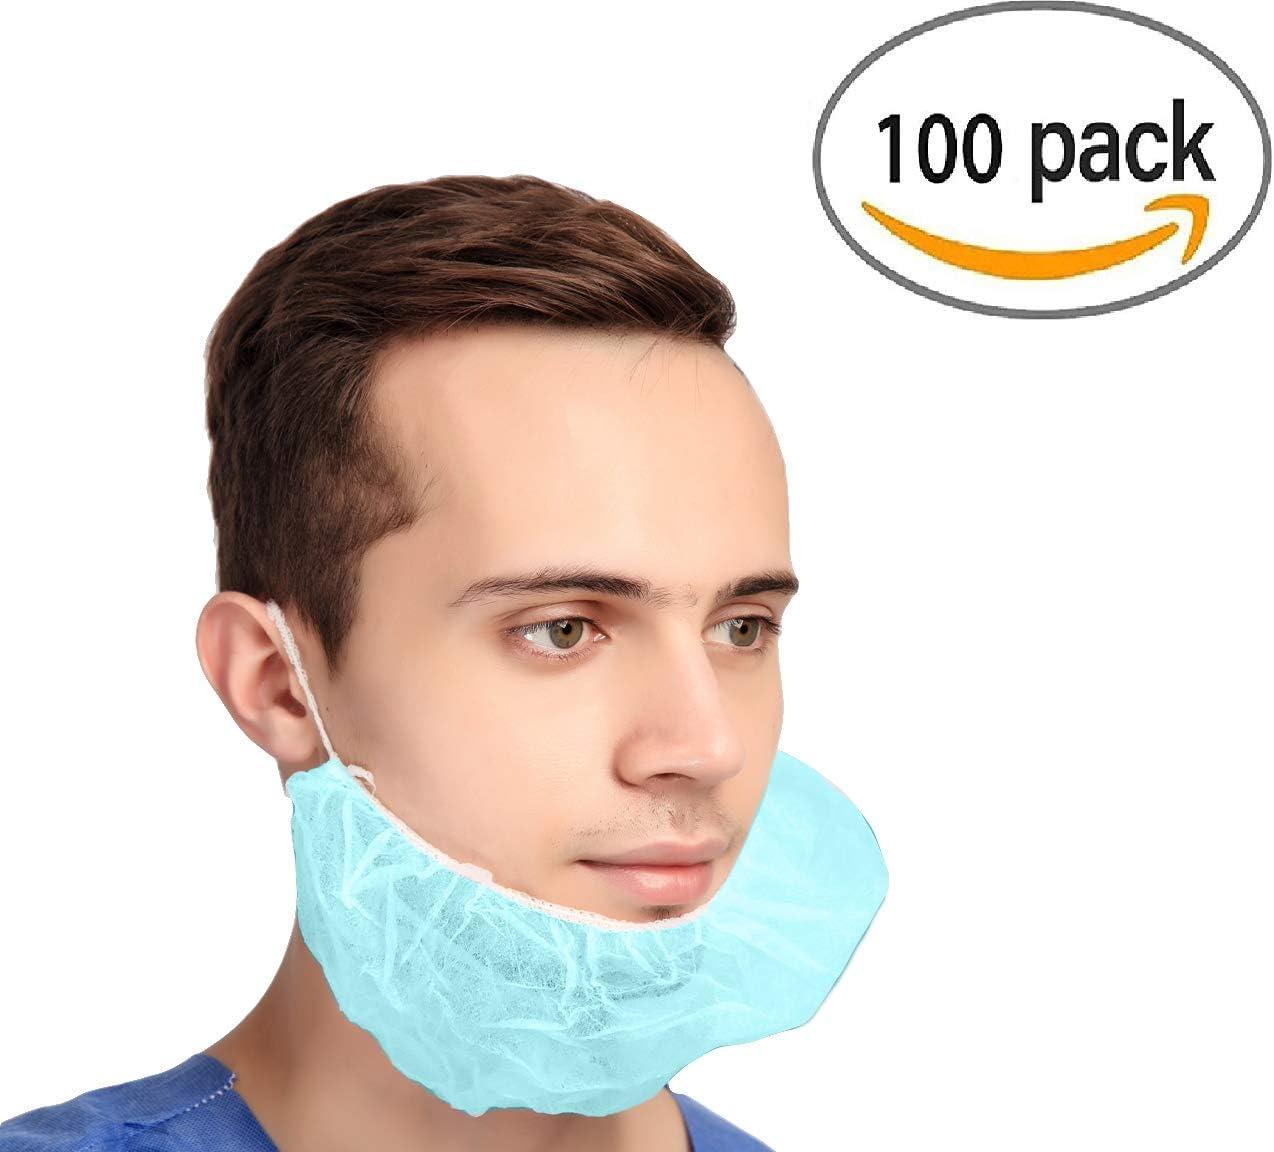 Breathable /& Lightweight. Blue Beard Guards Single Loop 100 Pack of Disposable Beard Covers 18 Heavy Duty Beard caps Premium Quality Beard Protectors Facial Hair Covering